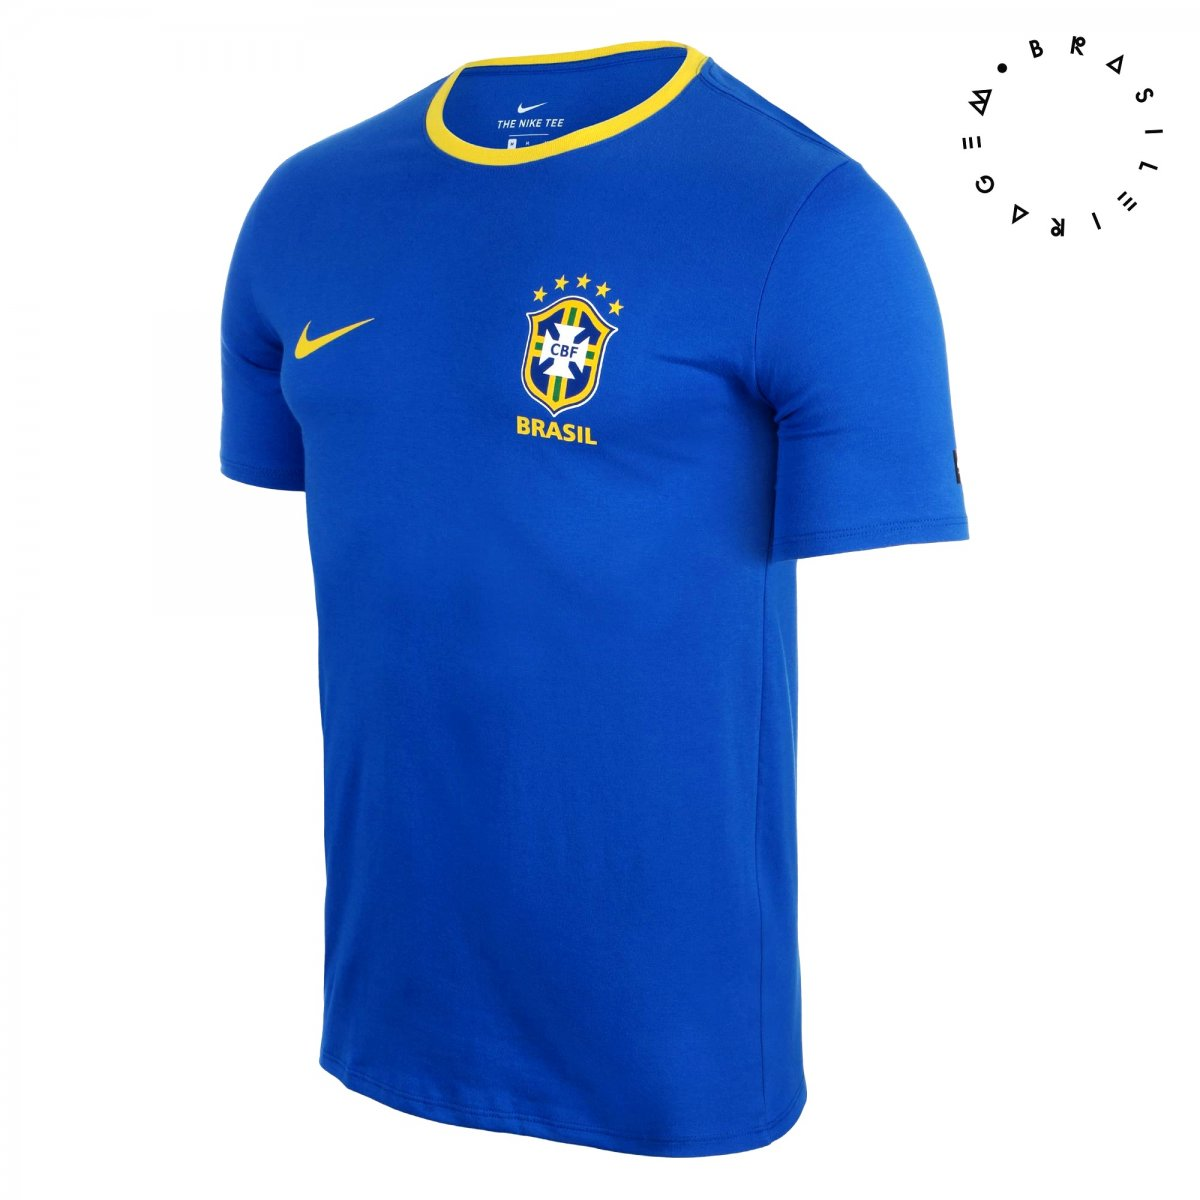 a176b011768dc Camisa Masculina Nike Brasil CBF Crest 2018 888320-403 - Azul ...